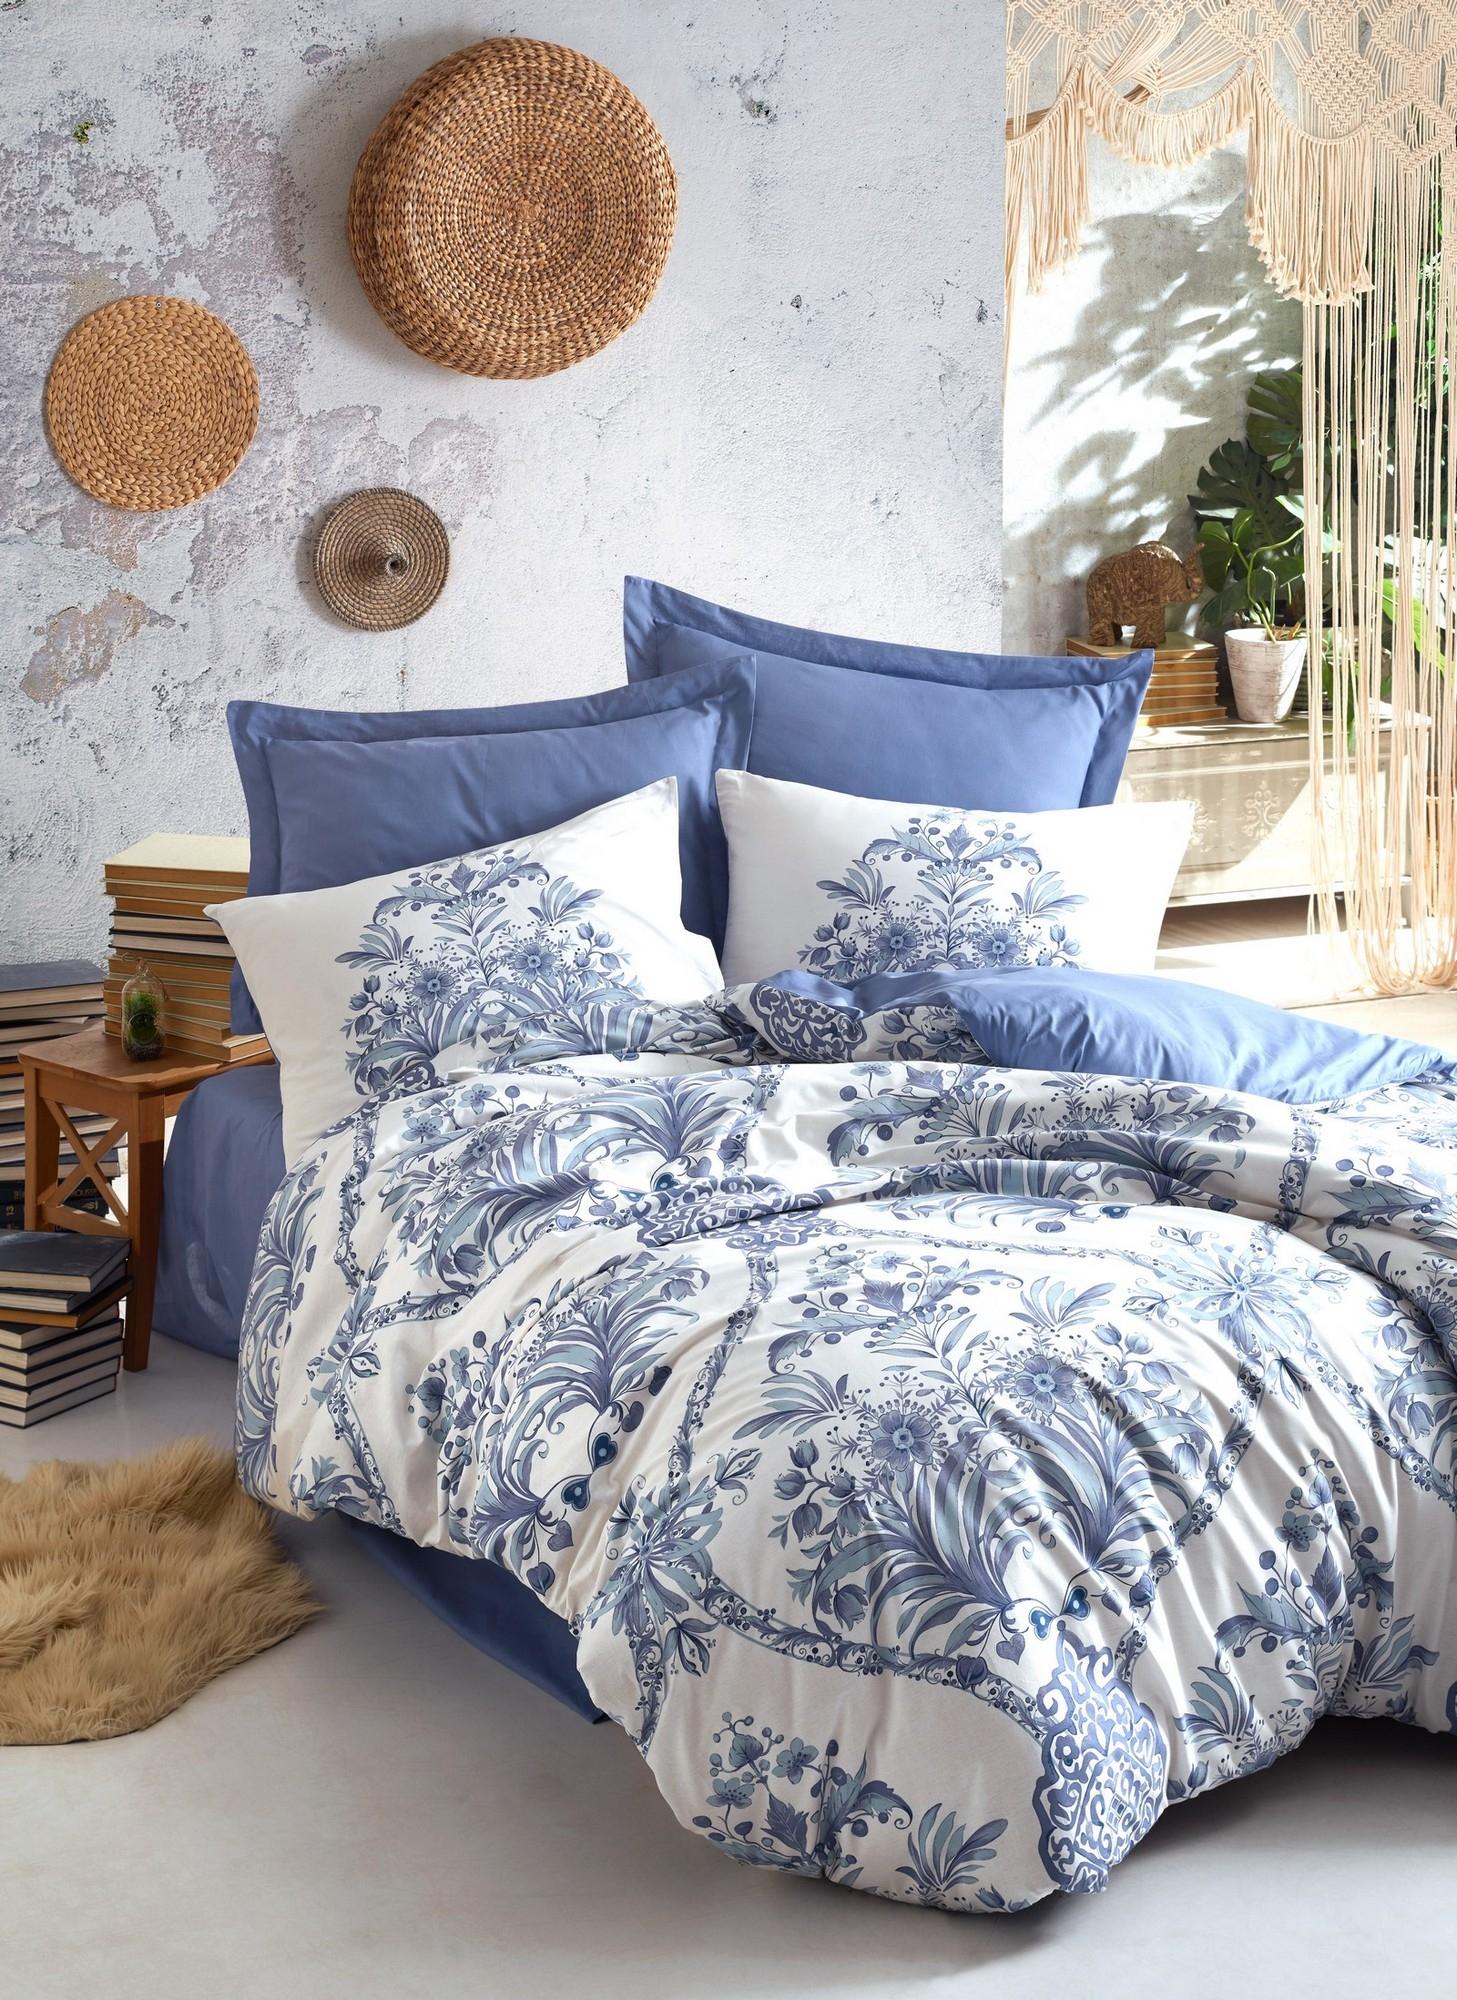 Lenjerie de pat din bumbac Ranforce, Egina Albastru / Alb, 200 x 220 cm imagine